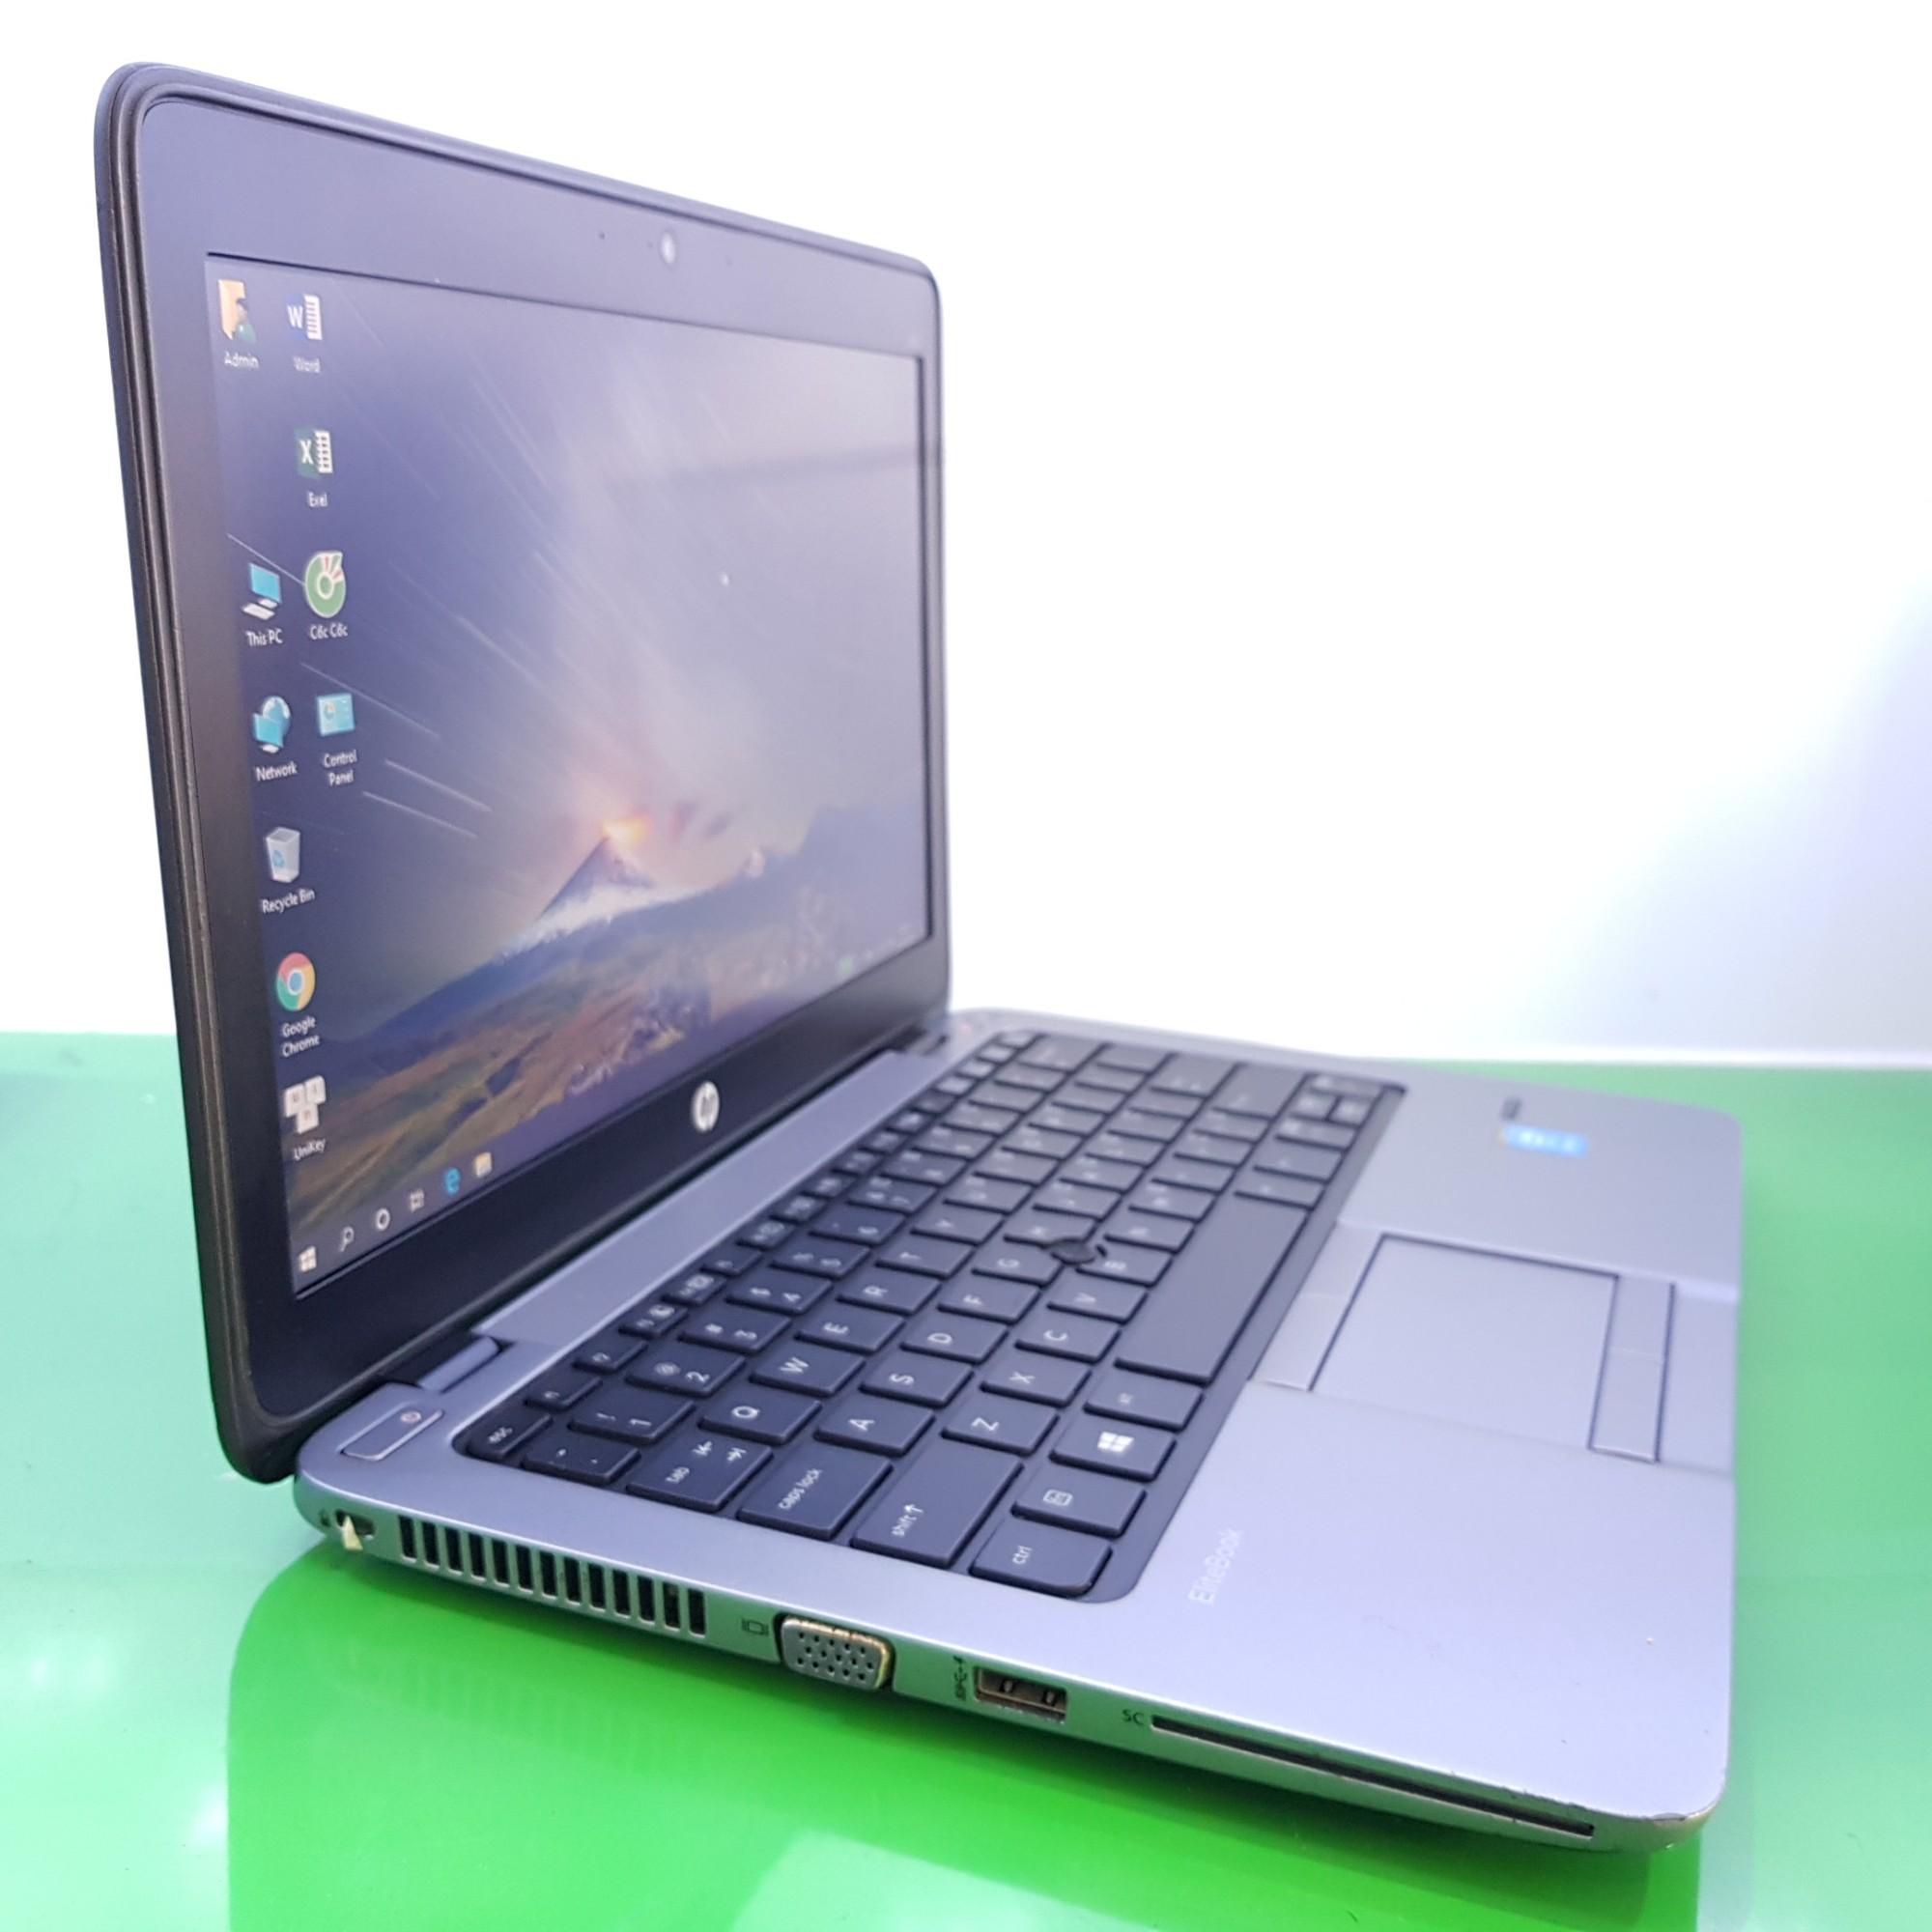 HP 820 G1